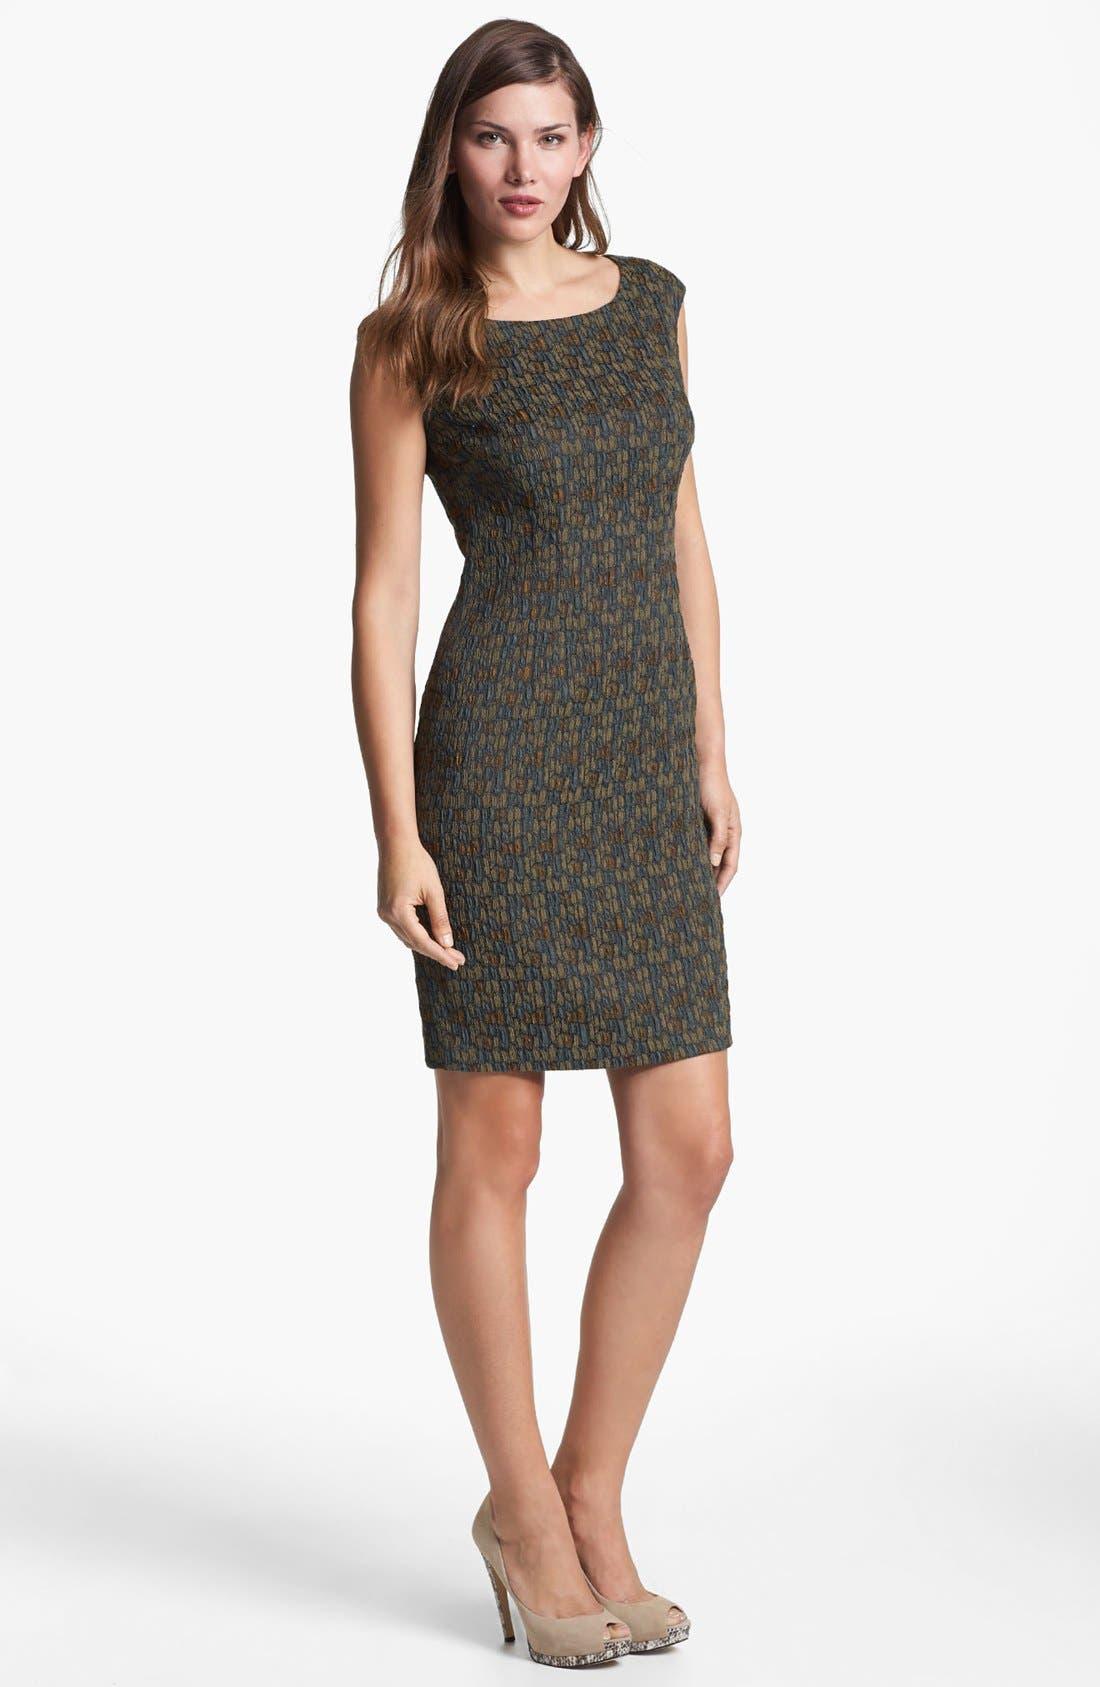 Main Image - Lafayette 148 New York 'Bianca - Fossilized Jacquard' Dress